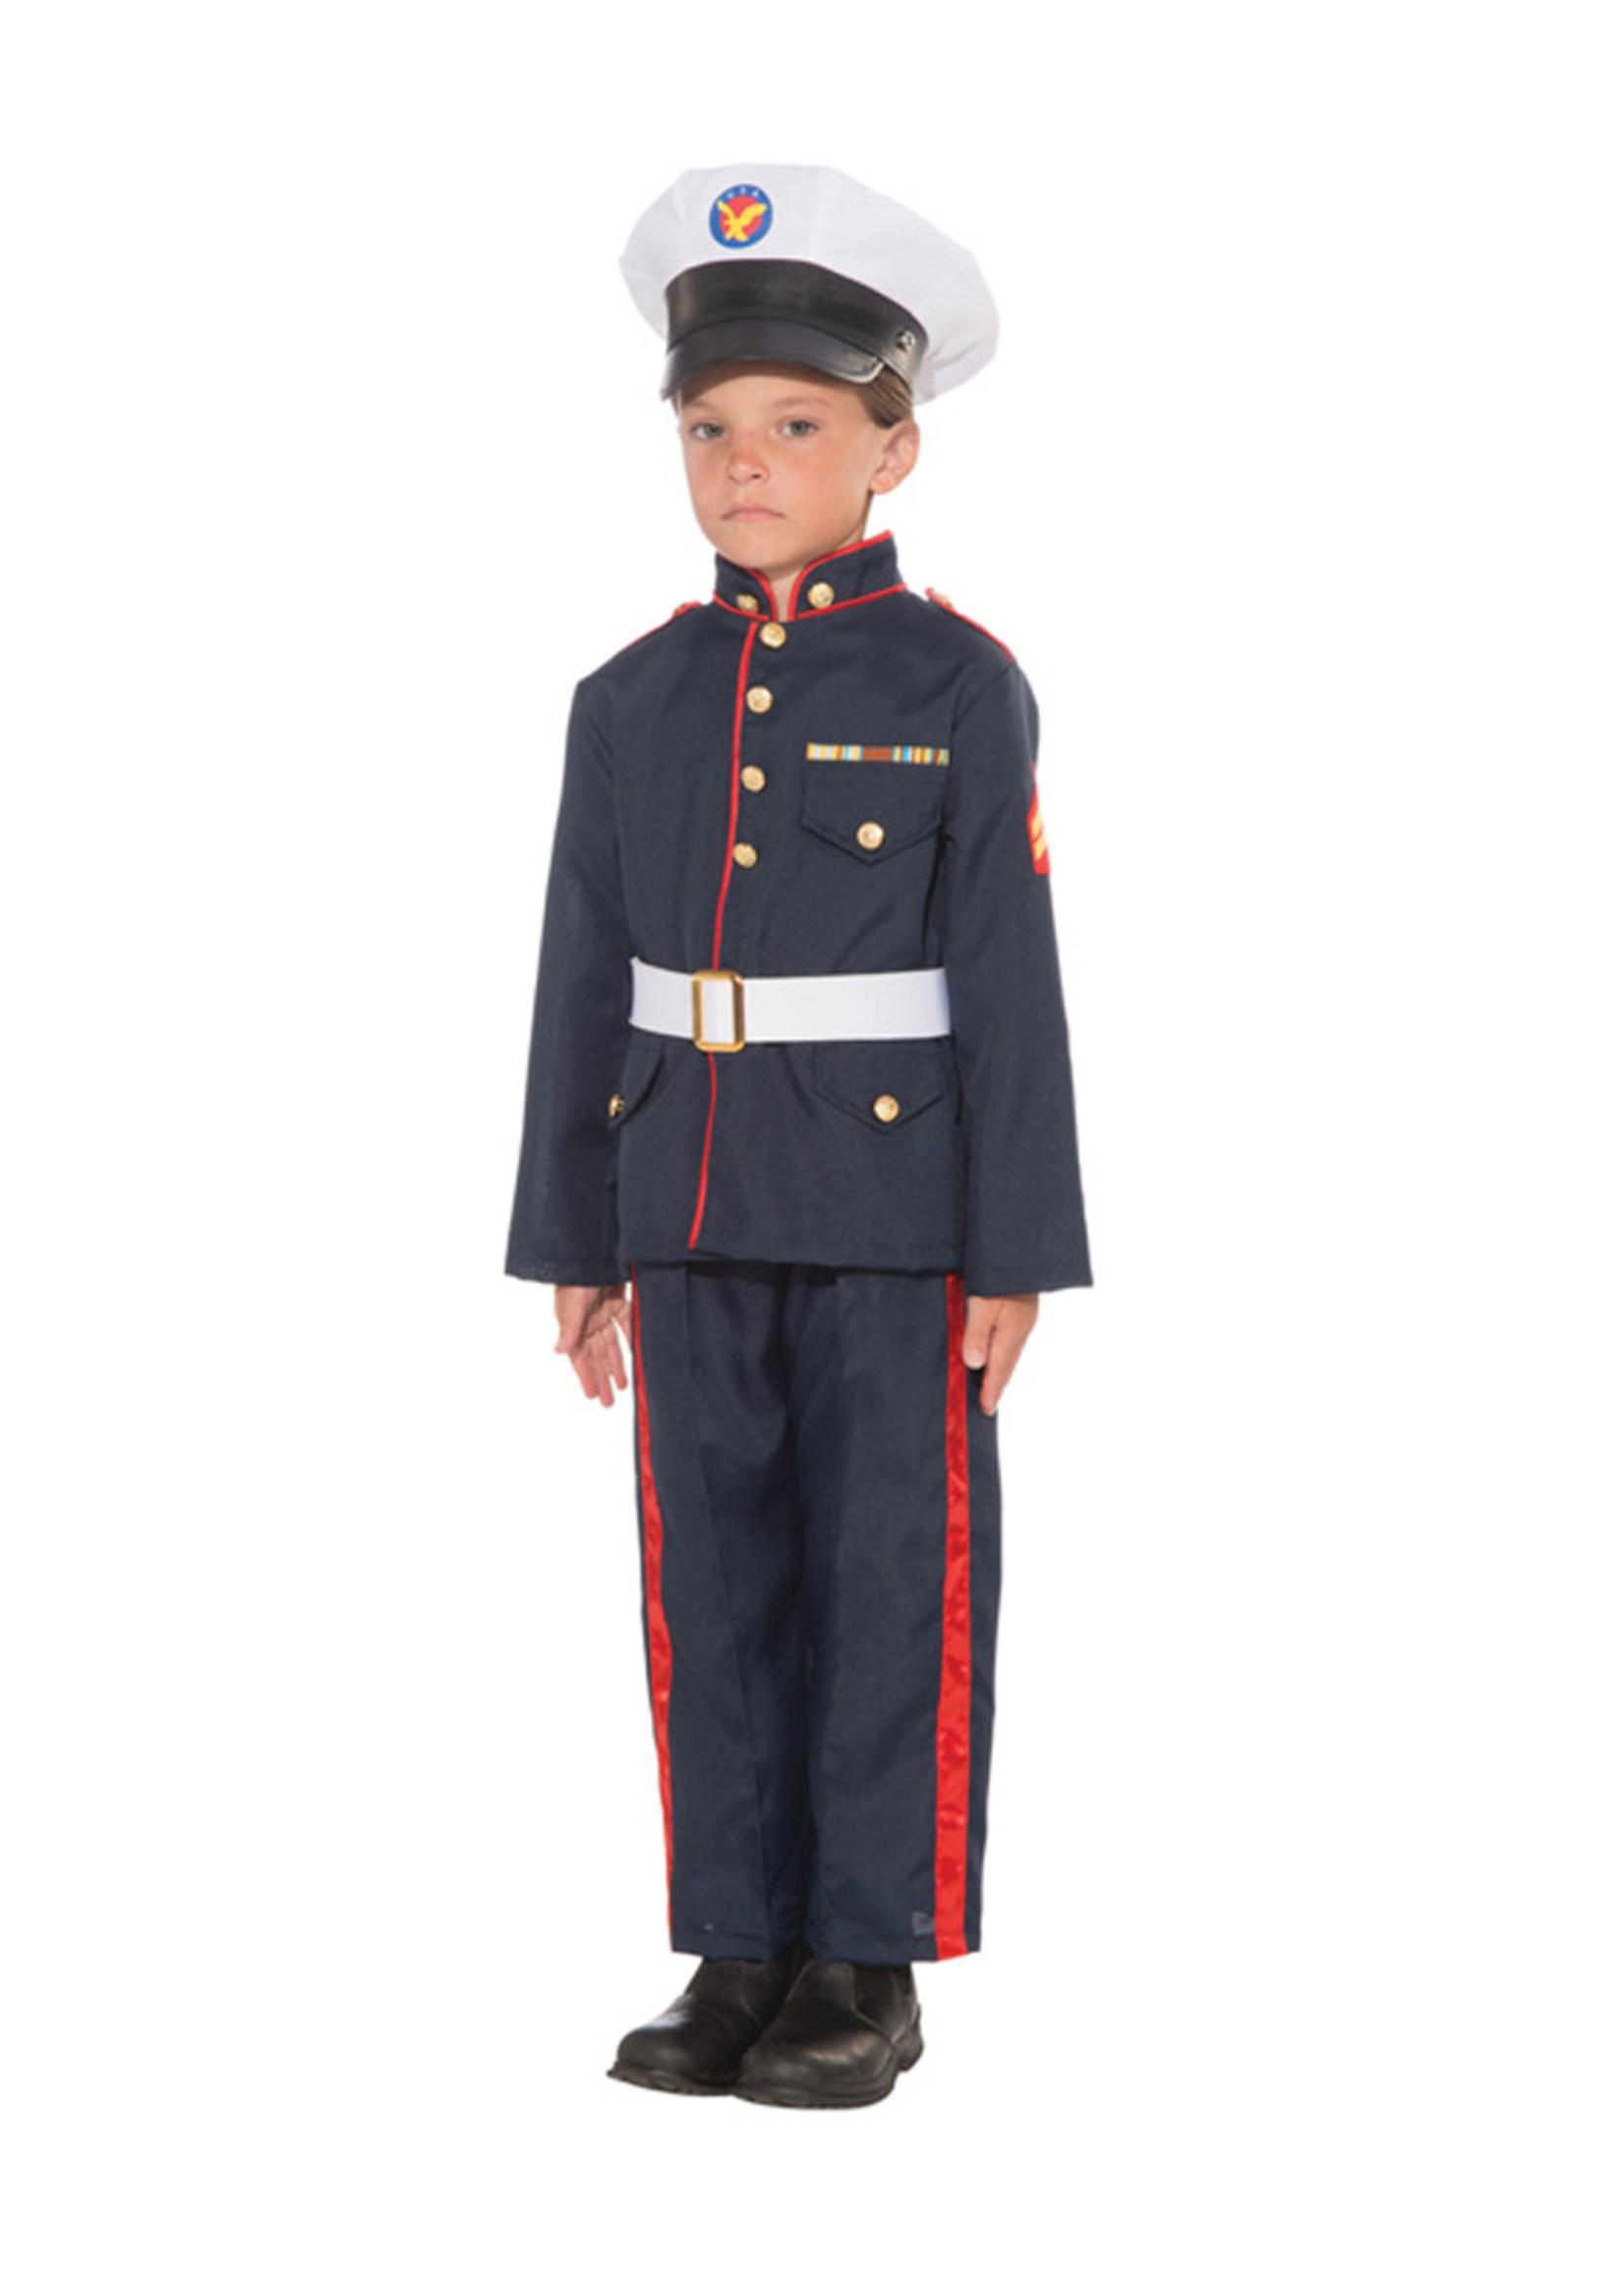 Formal Marine Costume - Boys